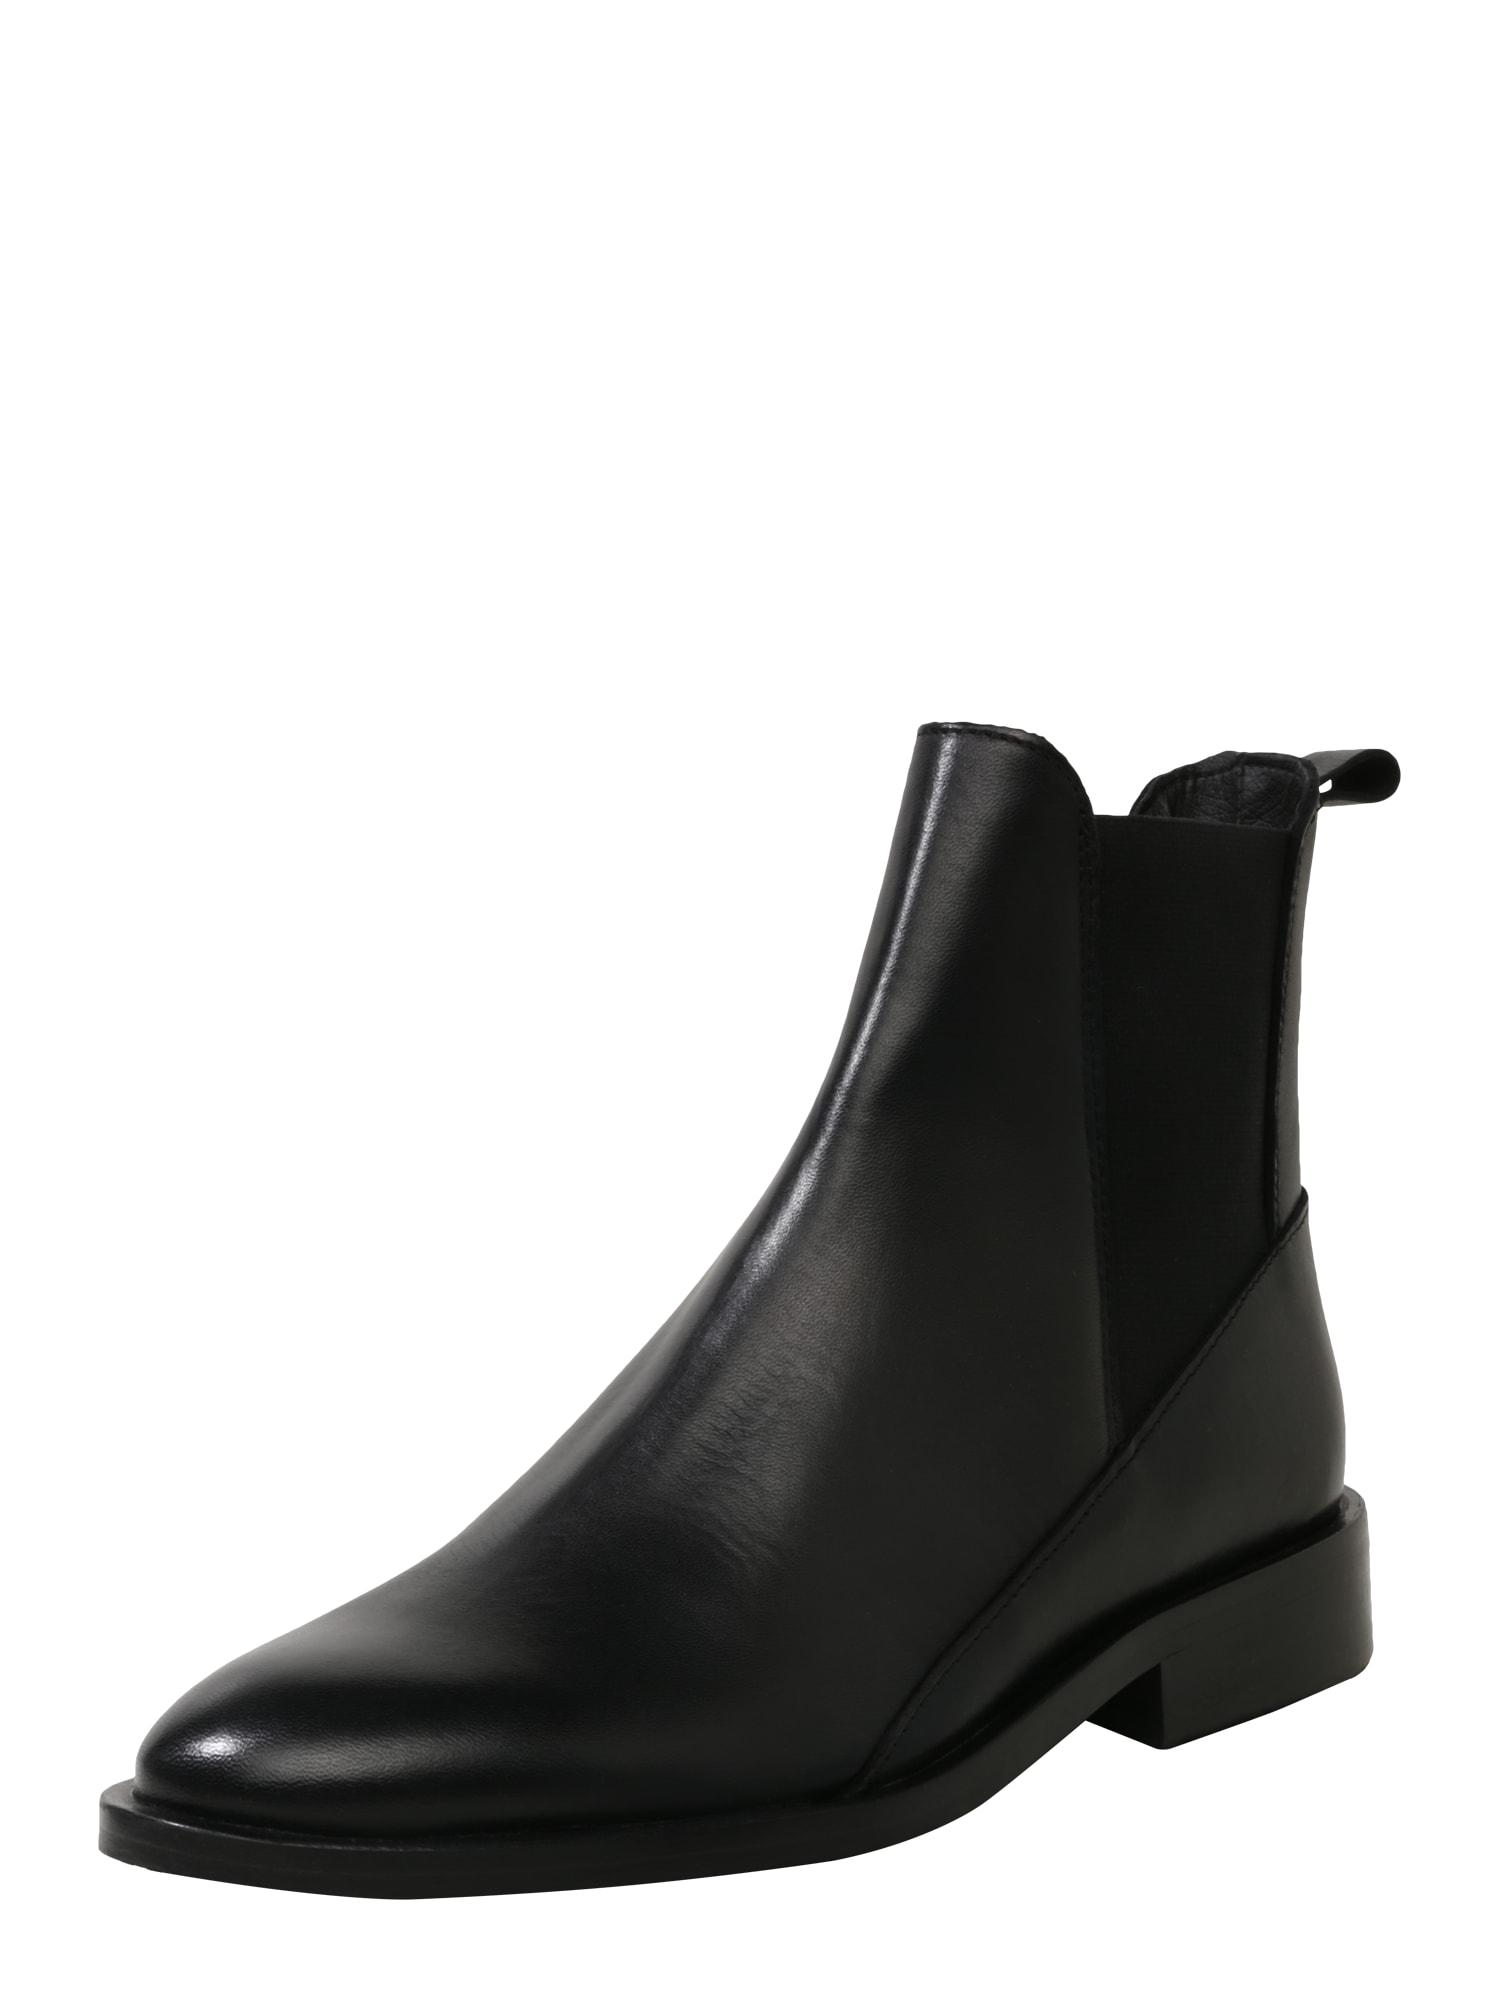 "PS Poelman ""Chelsea"" batai juoda"